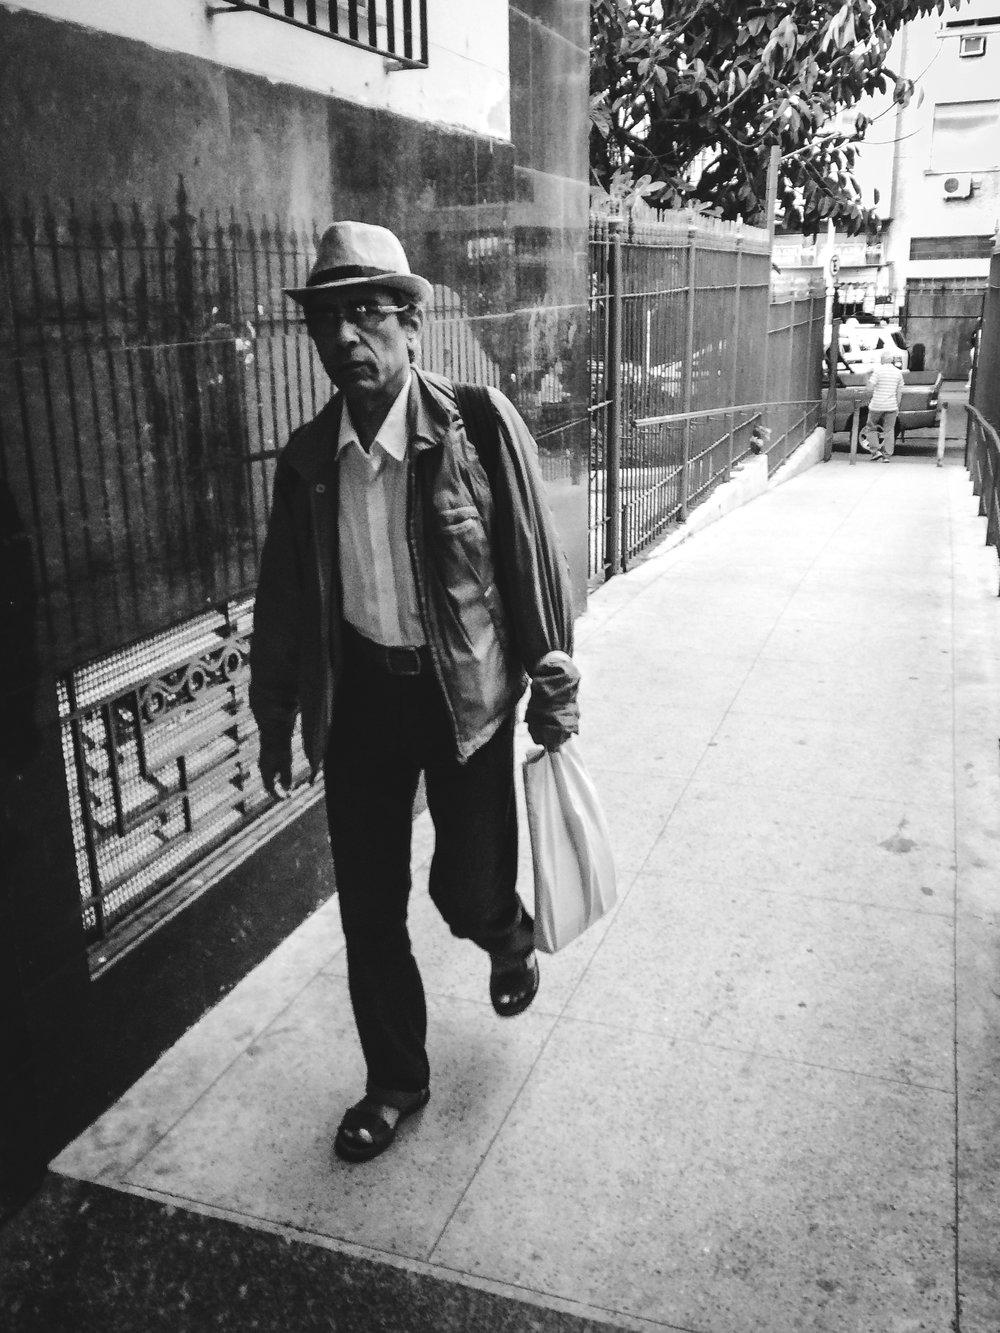 / Walking hat